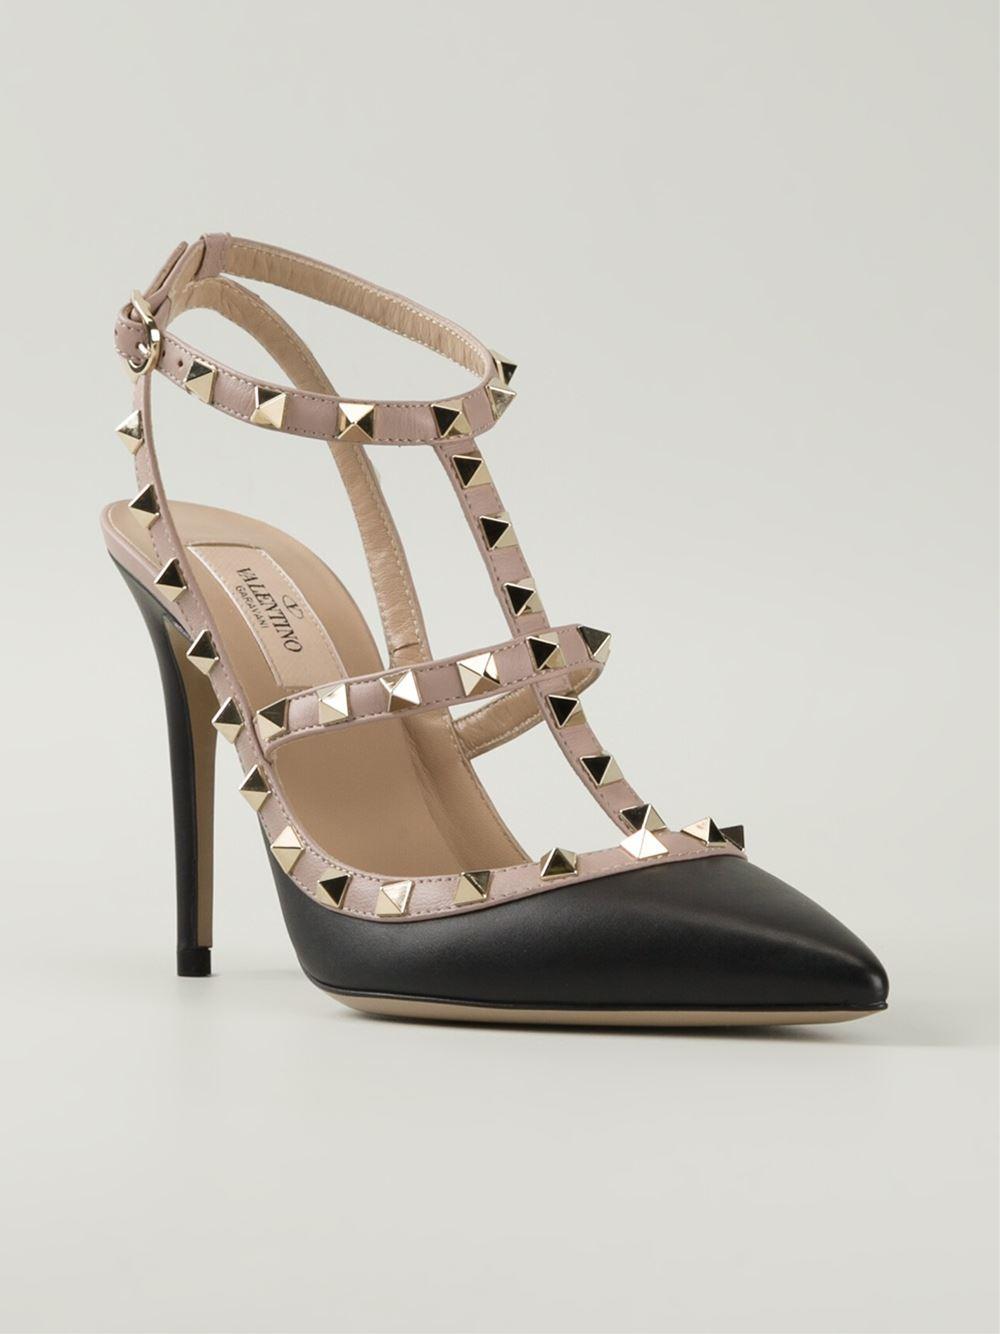 lyst valentino 39 rockstud 39 pump shoes in black. Black Bedroom Furniture Sets. Home Design Ideas